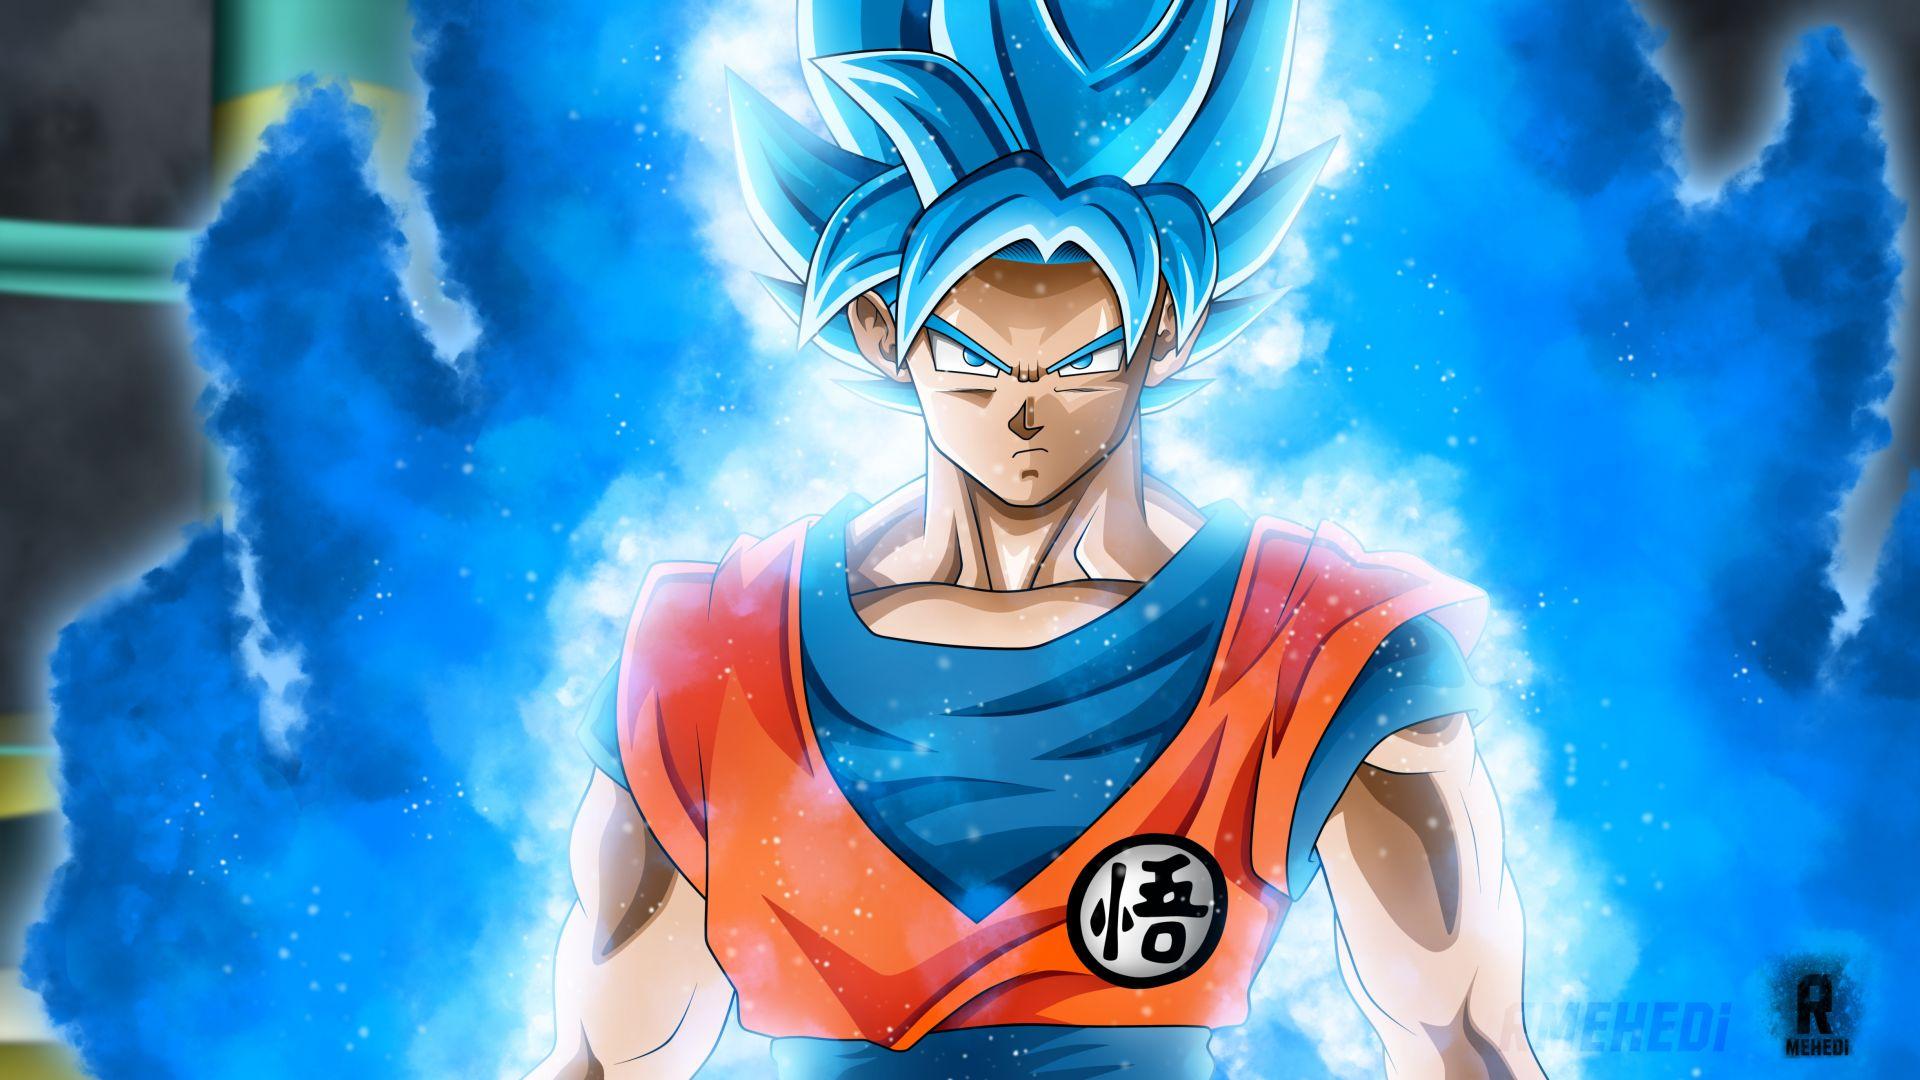 Desktop Wallpaper Dragon Ball Super Blue Goku Anime Hd Image